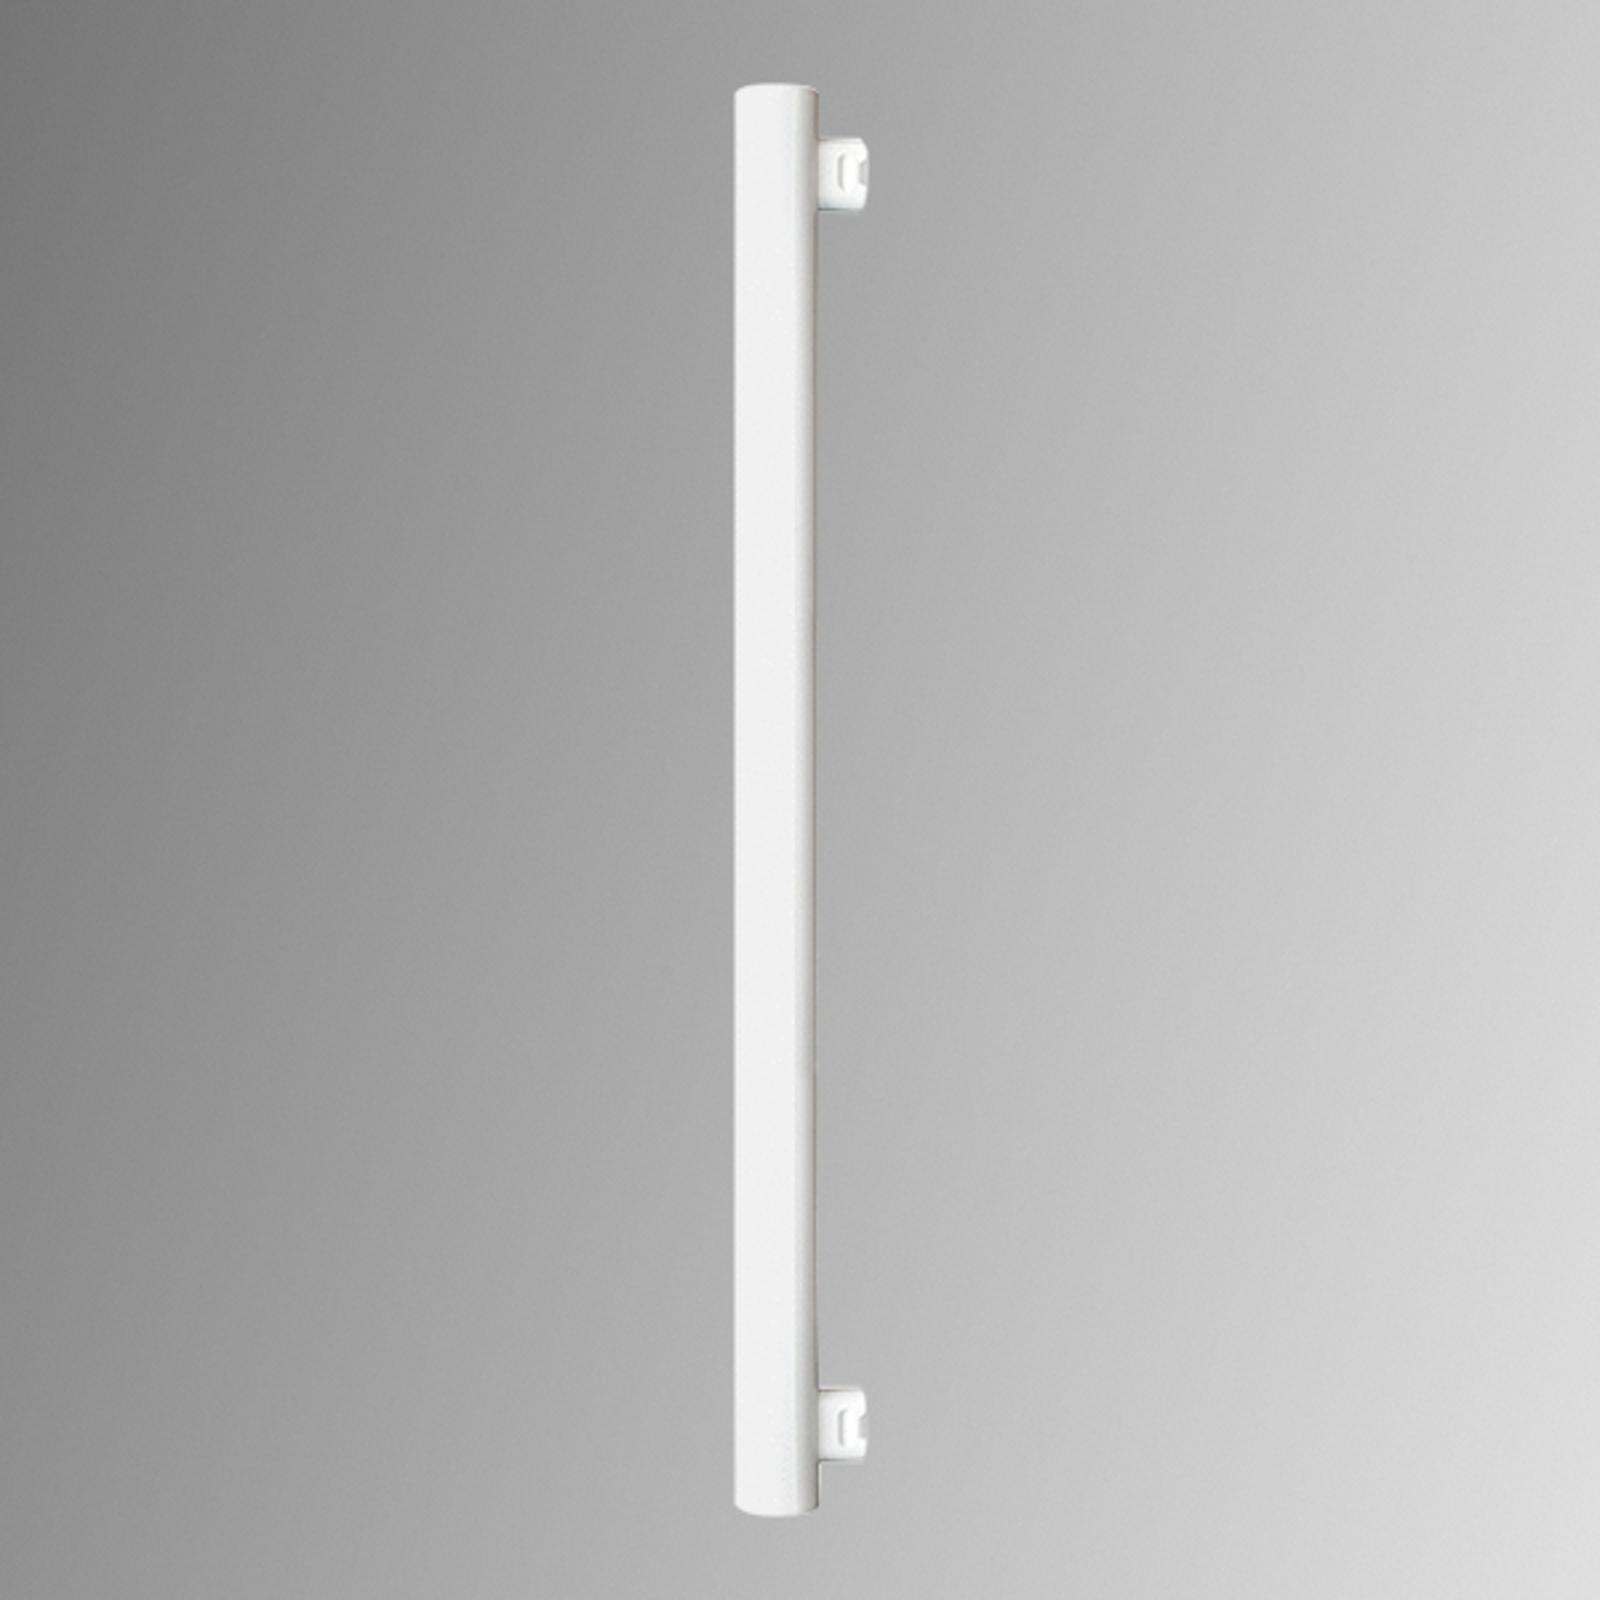 Żarówka liniowa LED S14s, ciepła biel, 480 lumenów